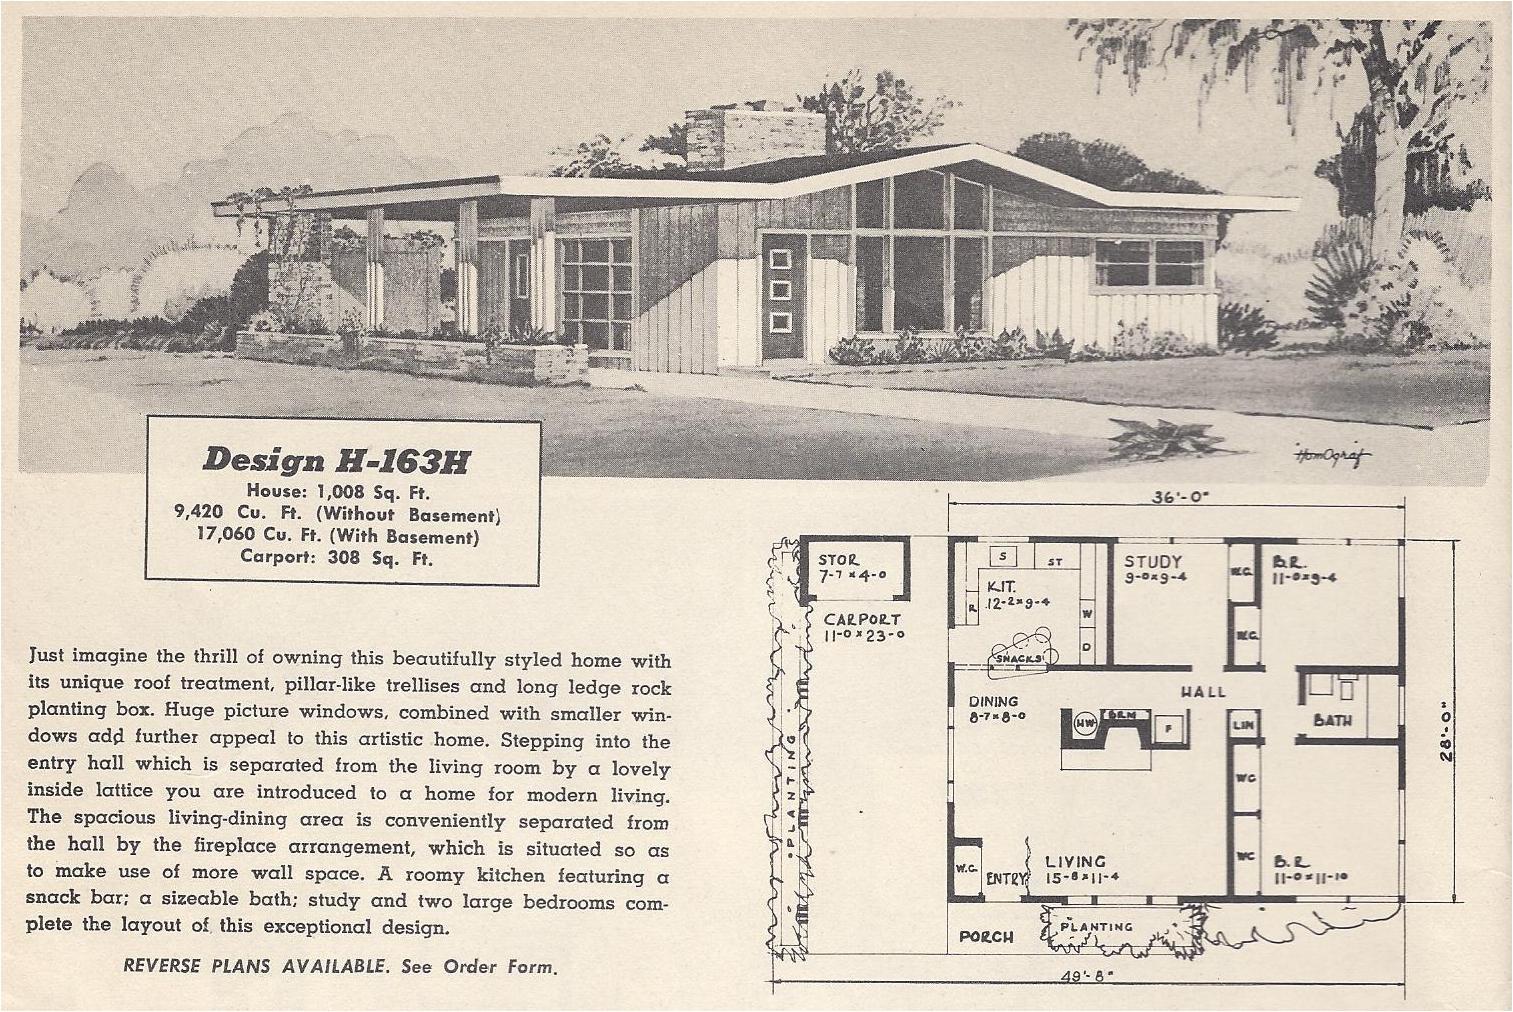 vintage house plans 163h